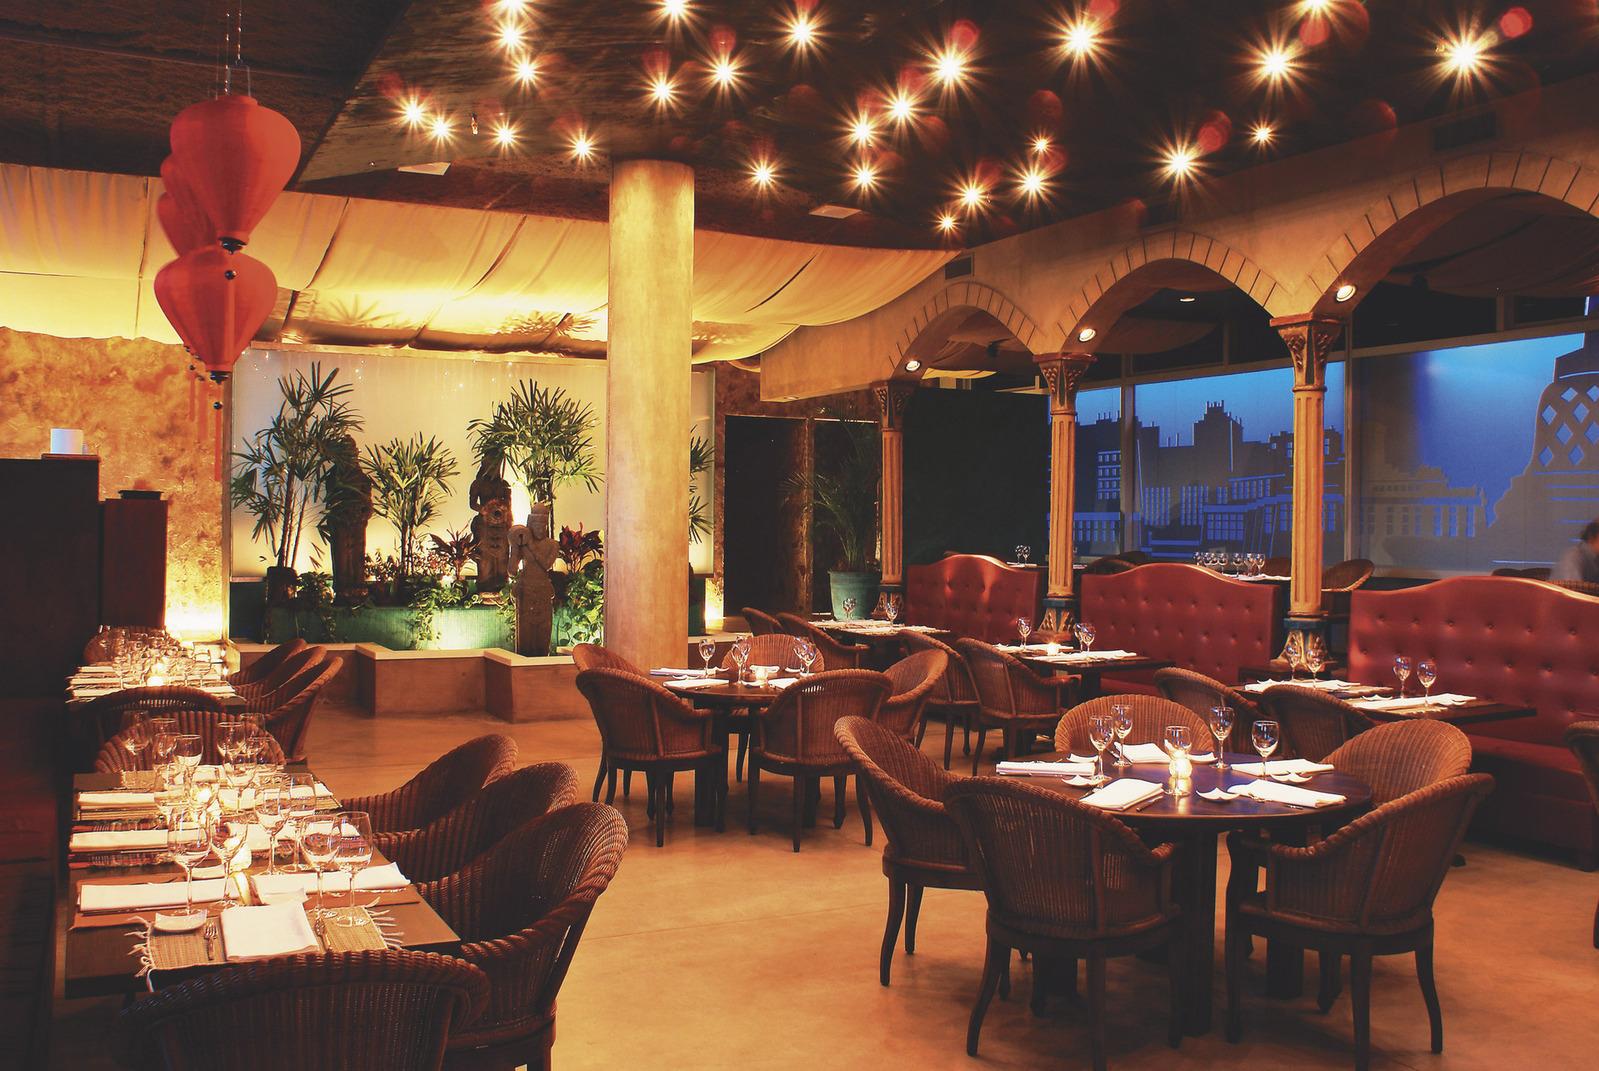 Buda Restaurant 1223975 1599×1070.jpg